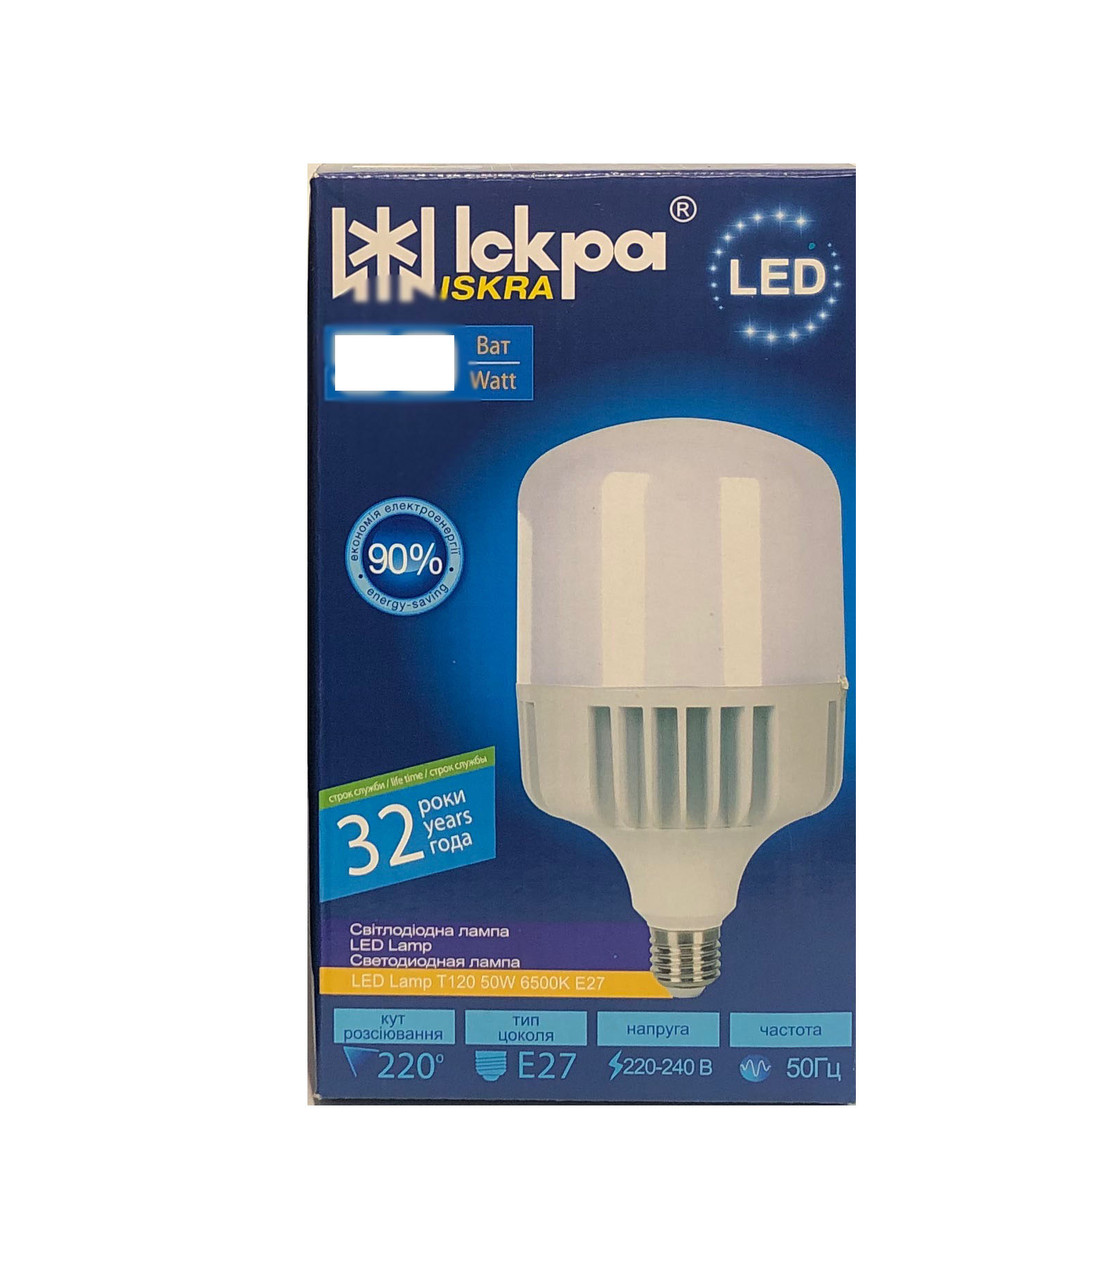 Светодидодная лампа LED высокомощная 50 Вт (Т120) 220B, E27, Холоднобіла